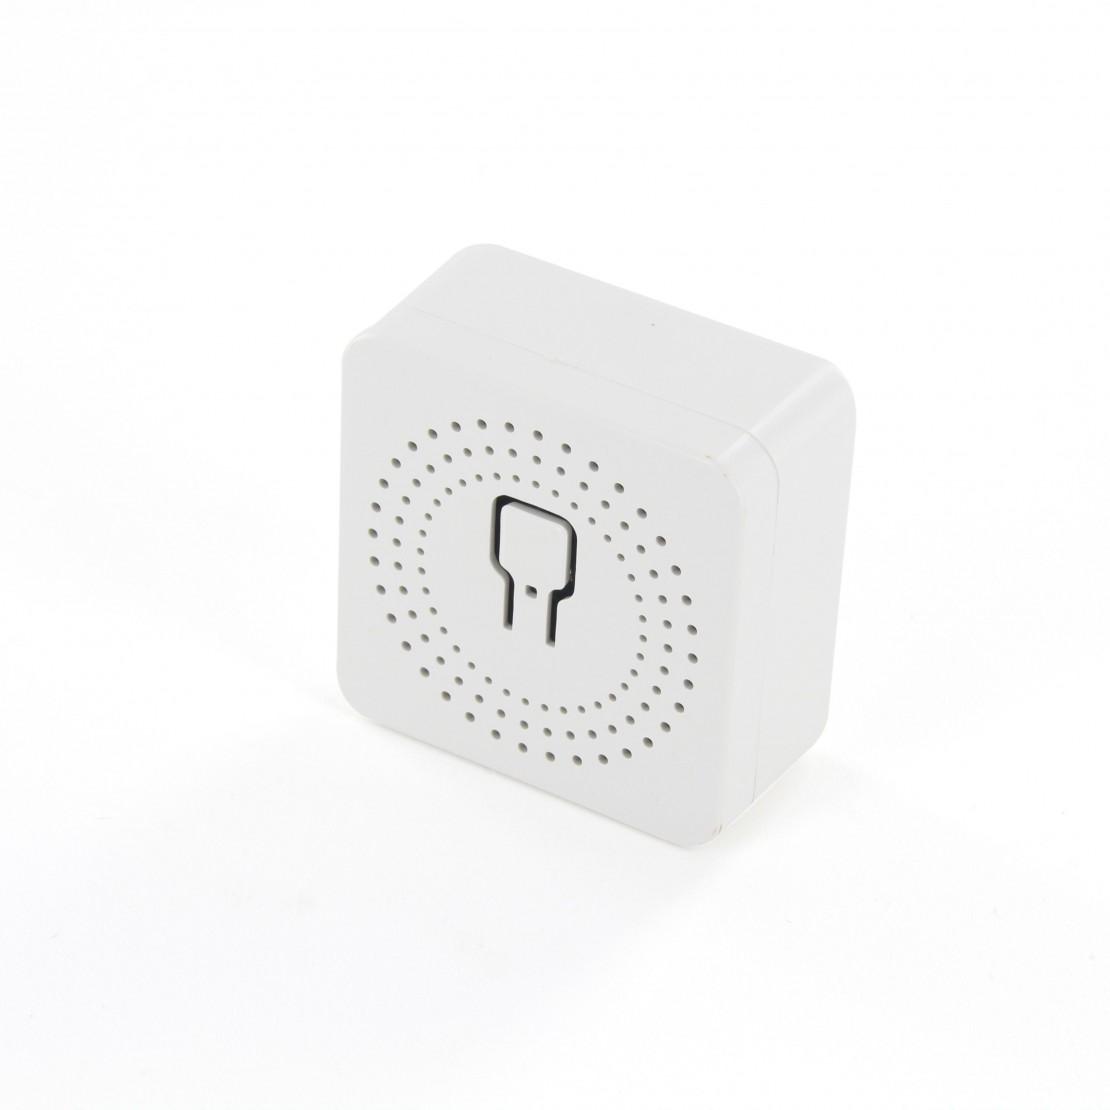 Mini-module for lighting